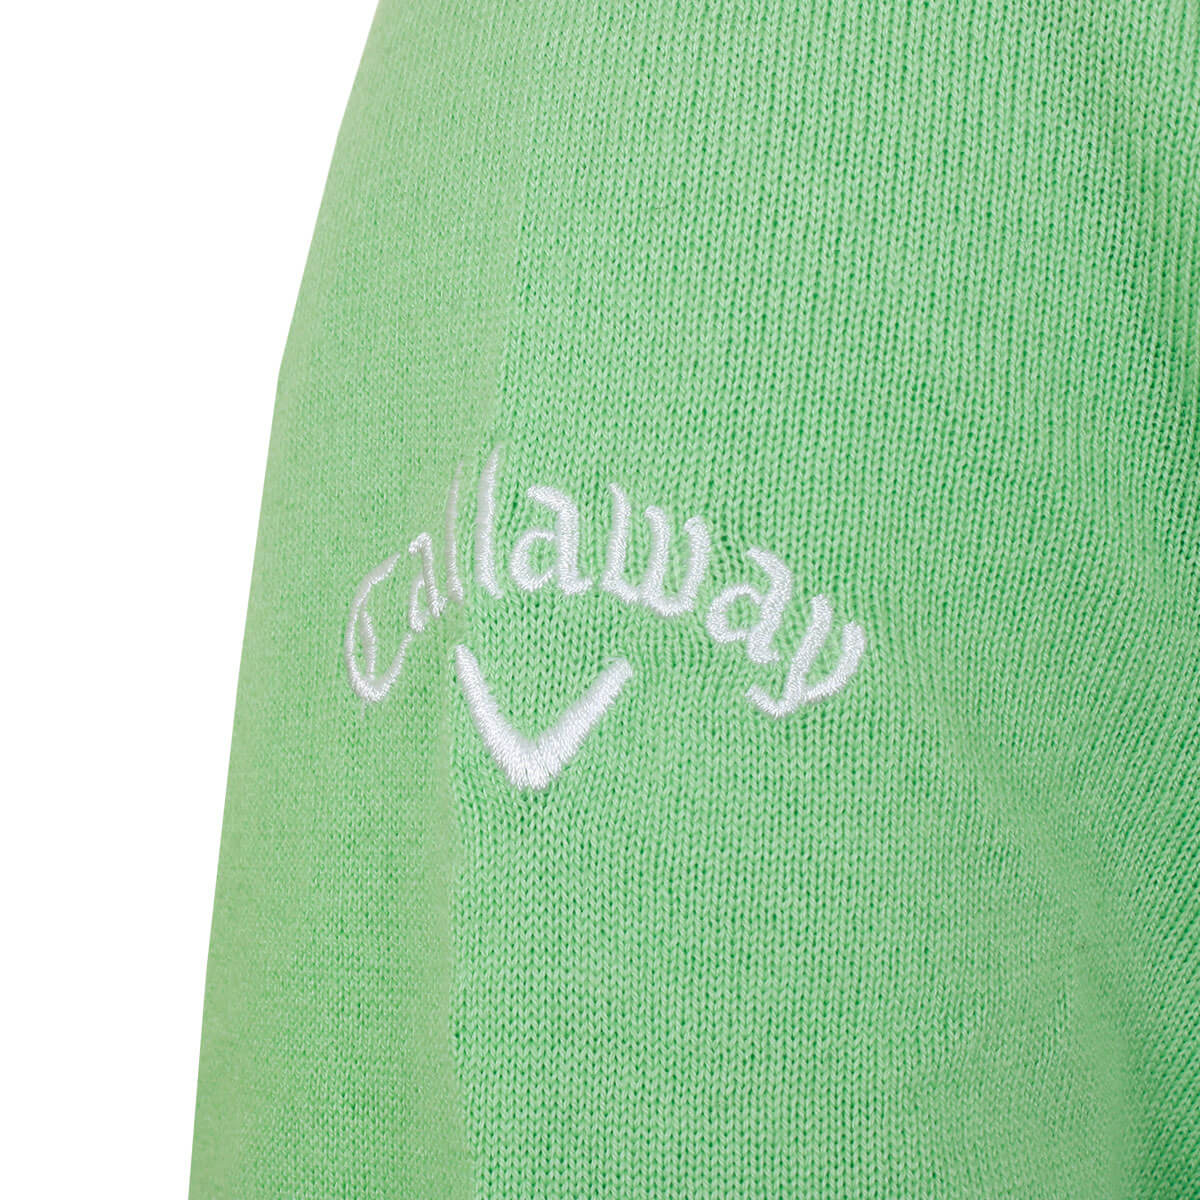 Callaway-Golf-Mens-1-4-Zip-Mock-Merino-Windproof-Sweater-Pullover-49-OFF-RRP thumbnail 10